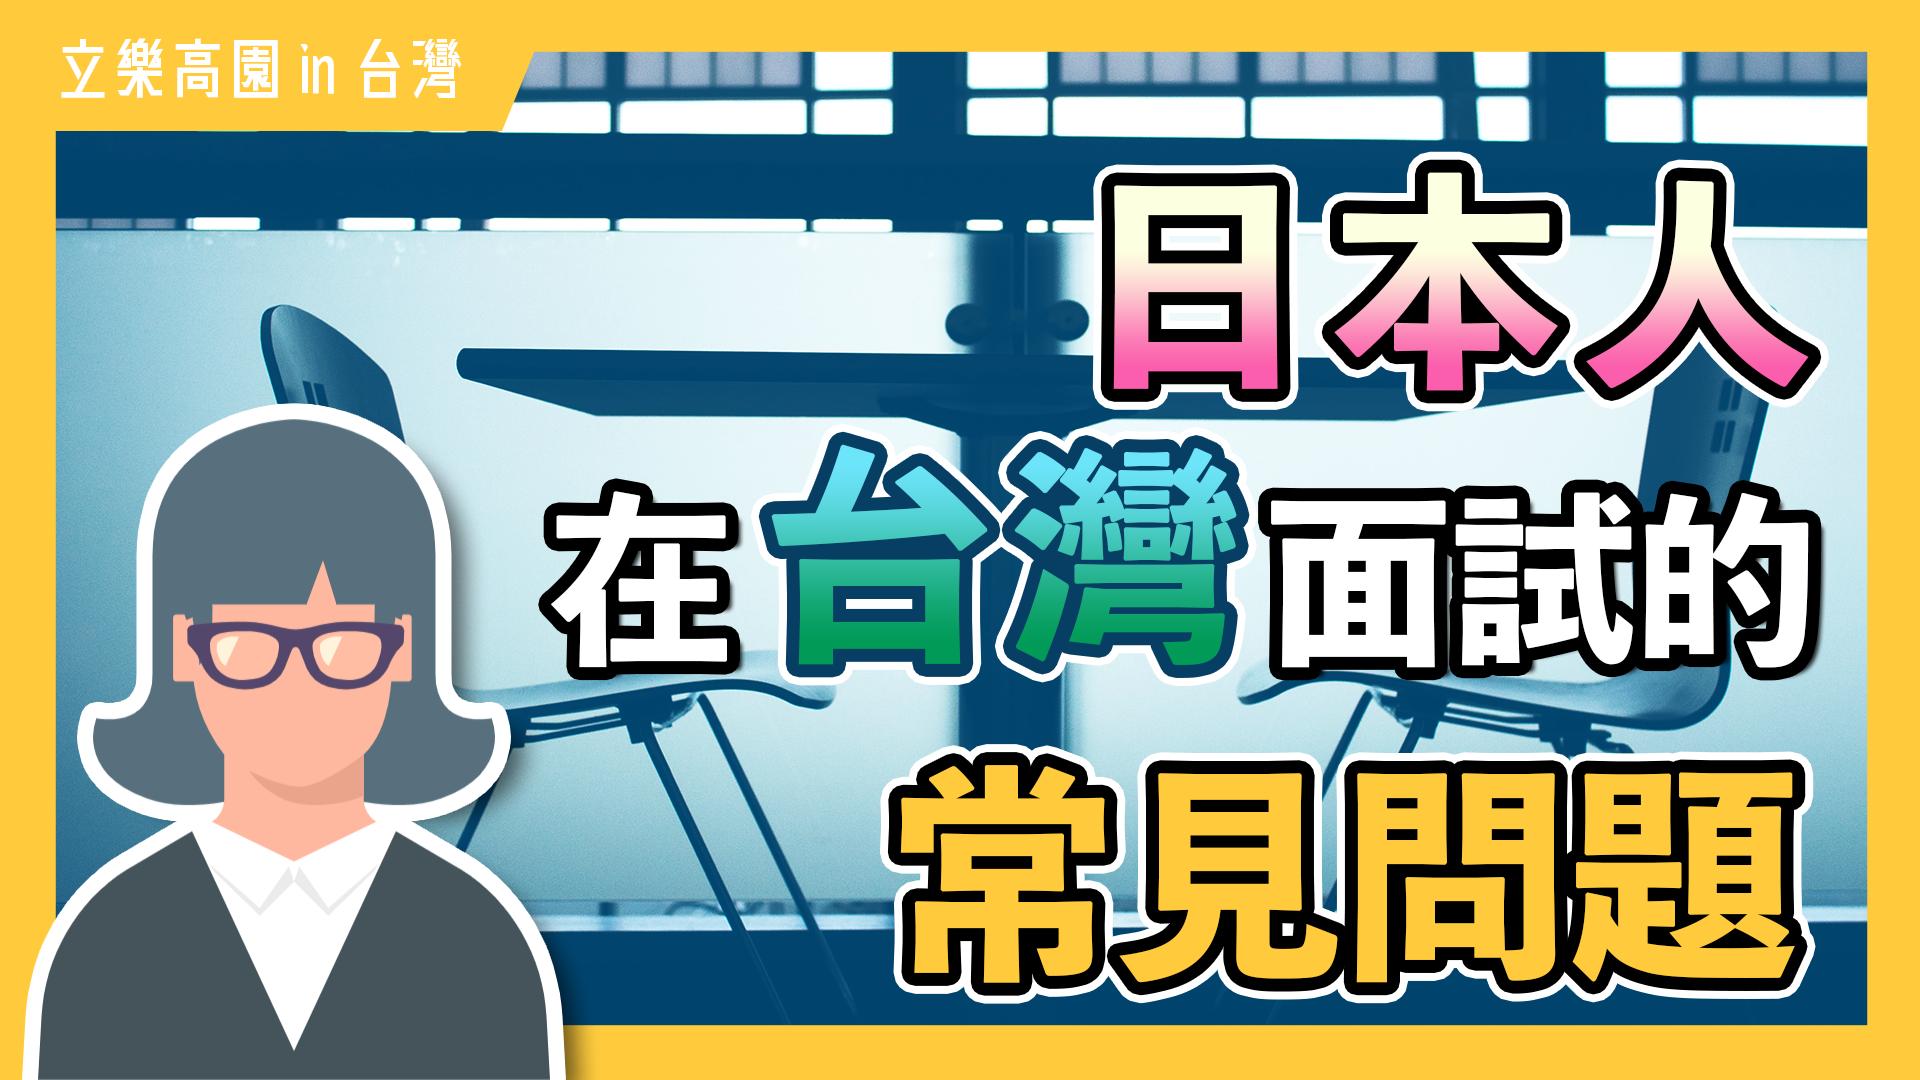 【DAILY】日本人在台灣「面試的常見問題」台灣生活工作相關解說#4| 立樂高園 in 台灣